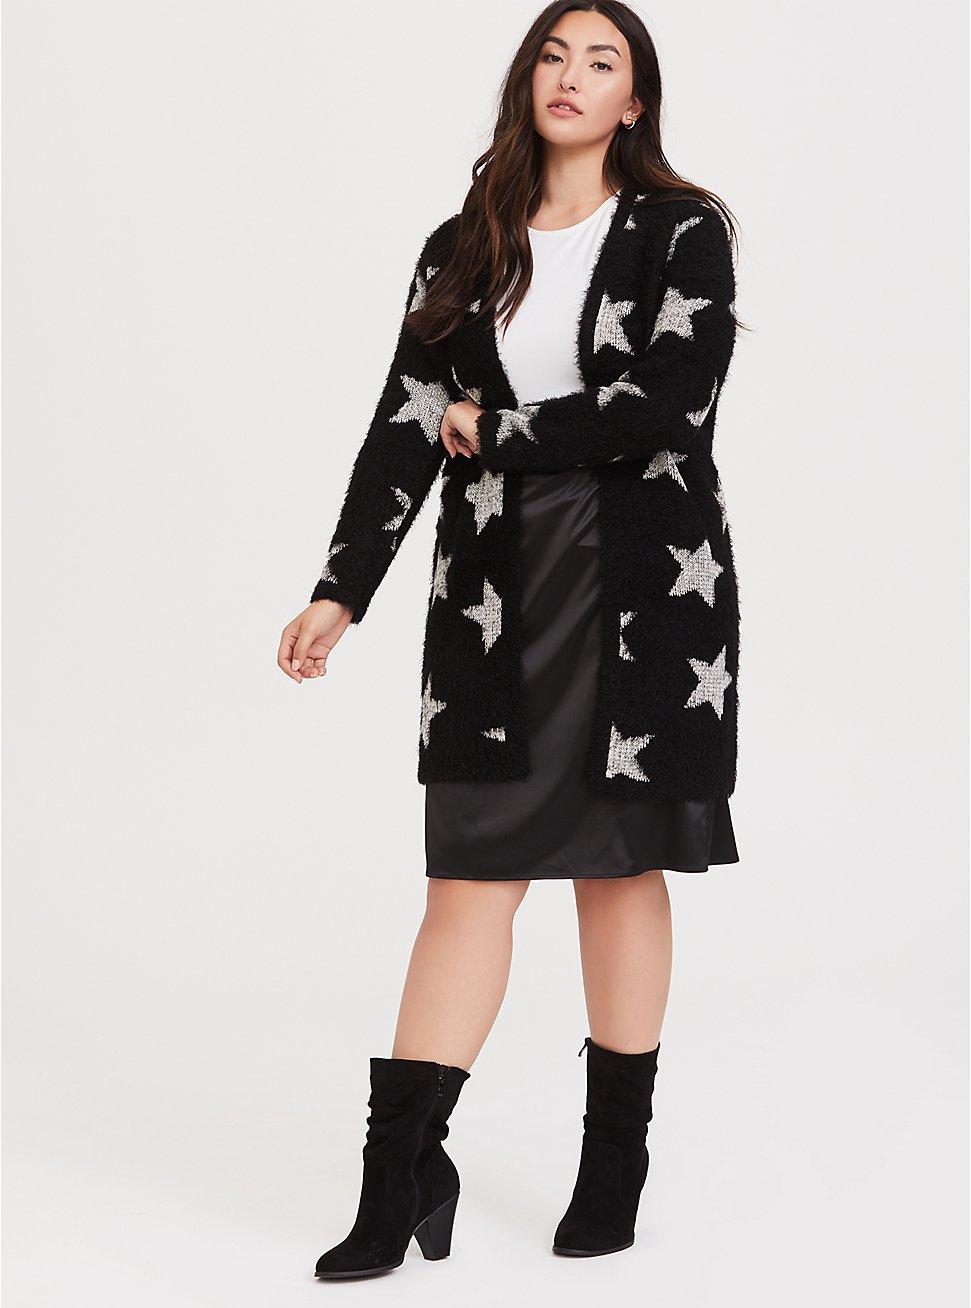 Black Star Sweater Coat, STAR FRENZY, hi-res